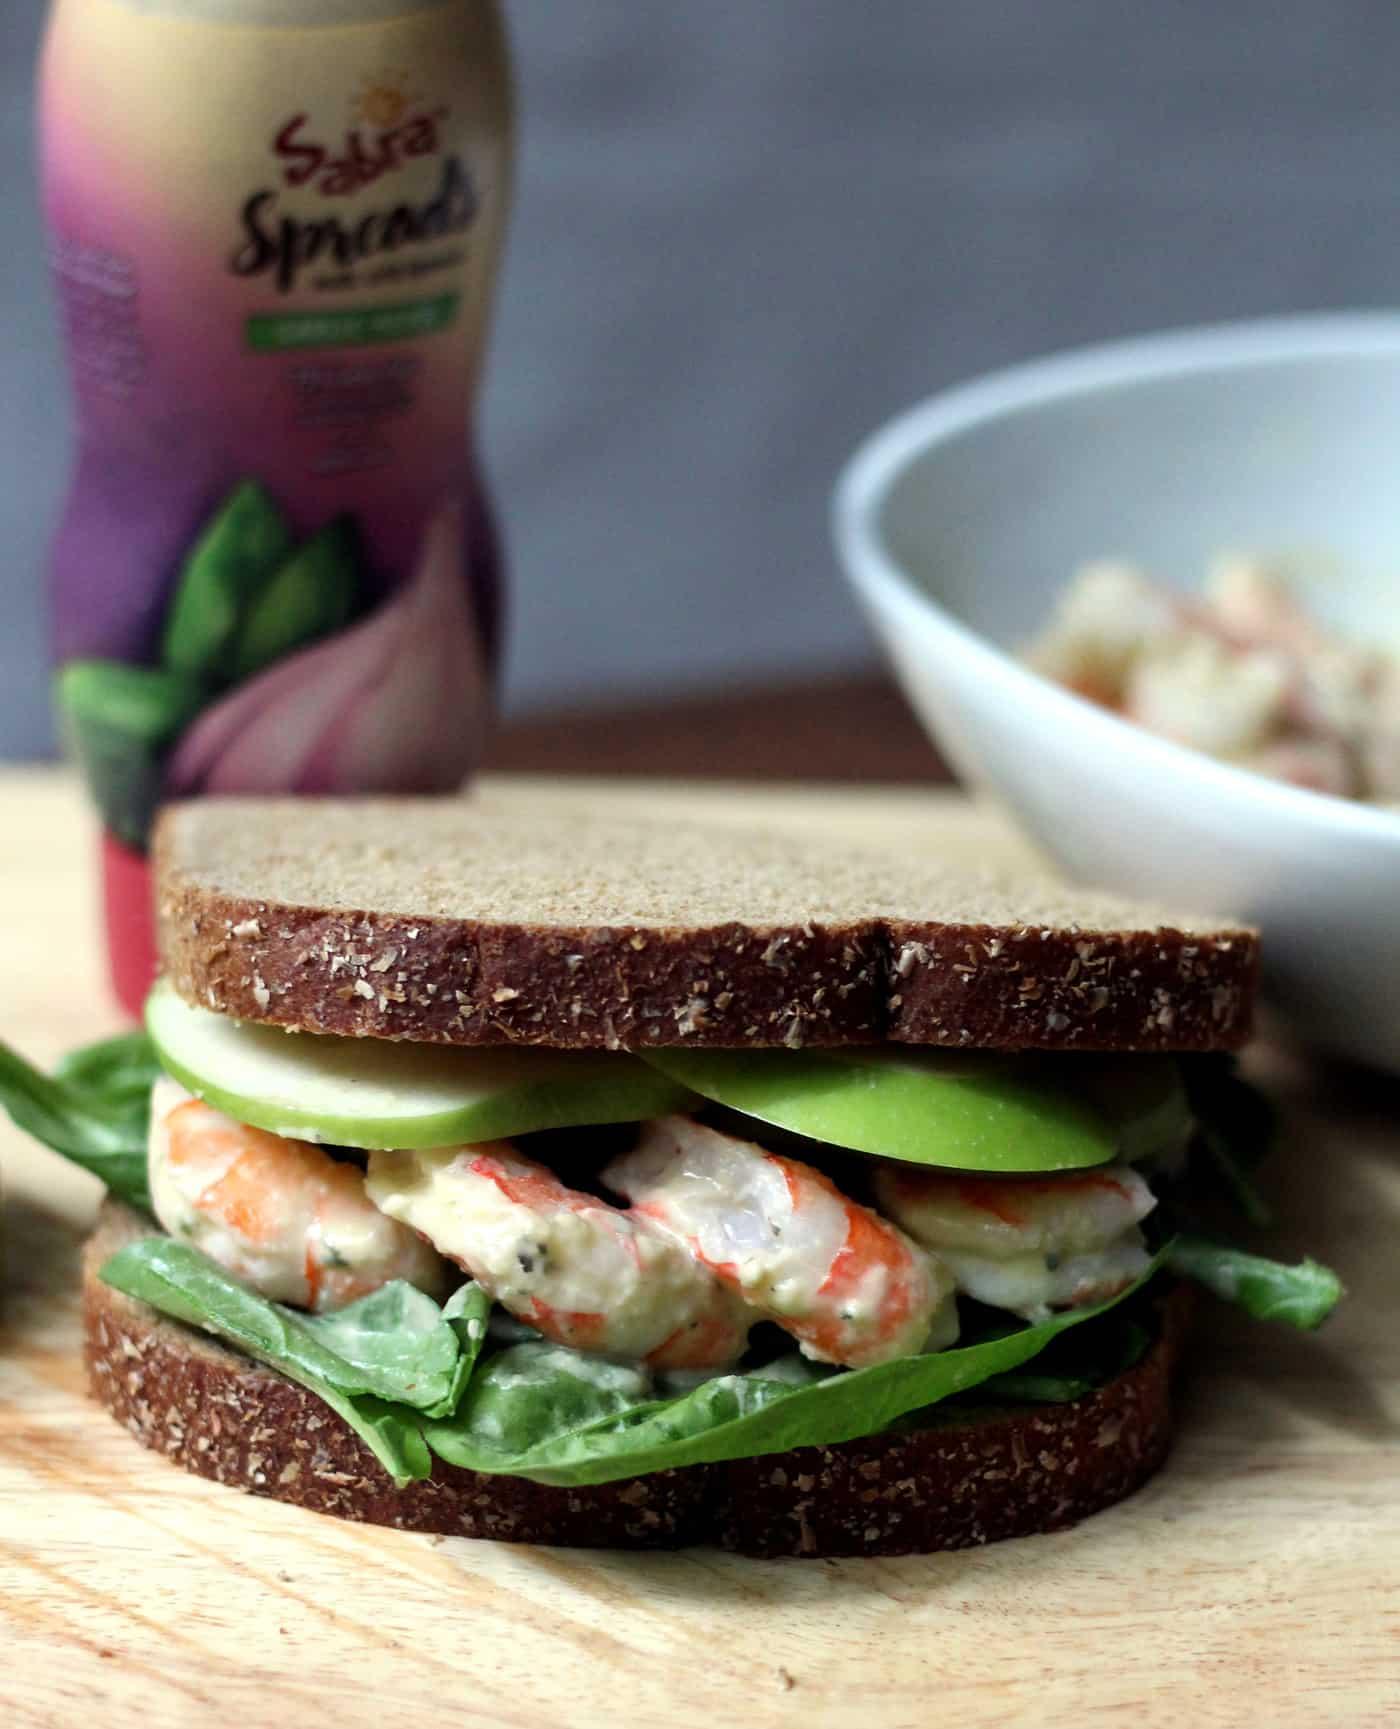 Garlic Herb Shrimp Sandwich with Green Apple